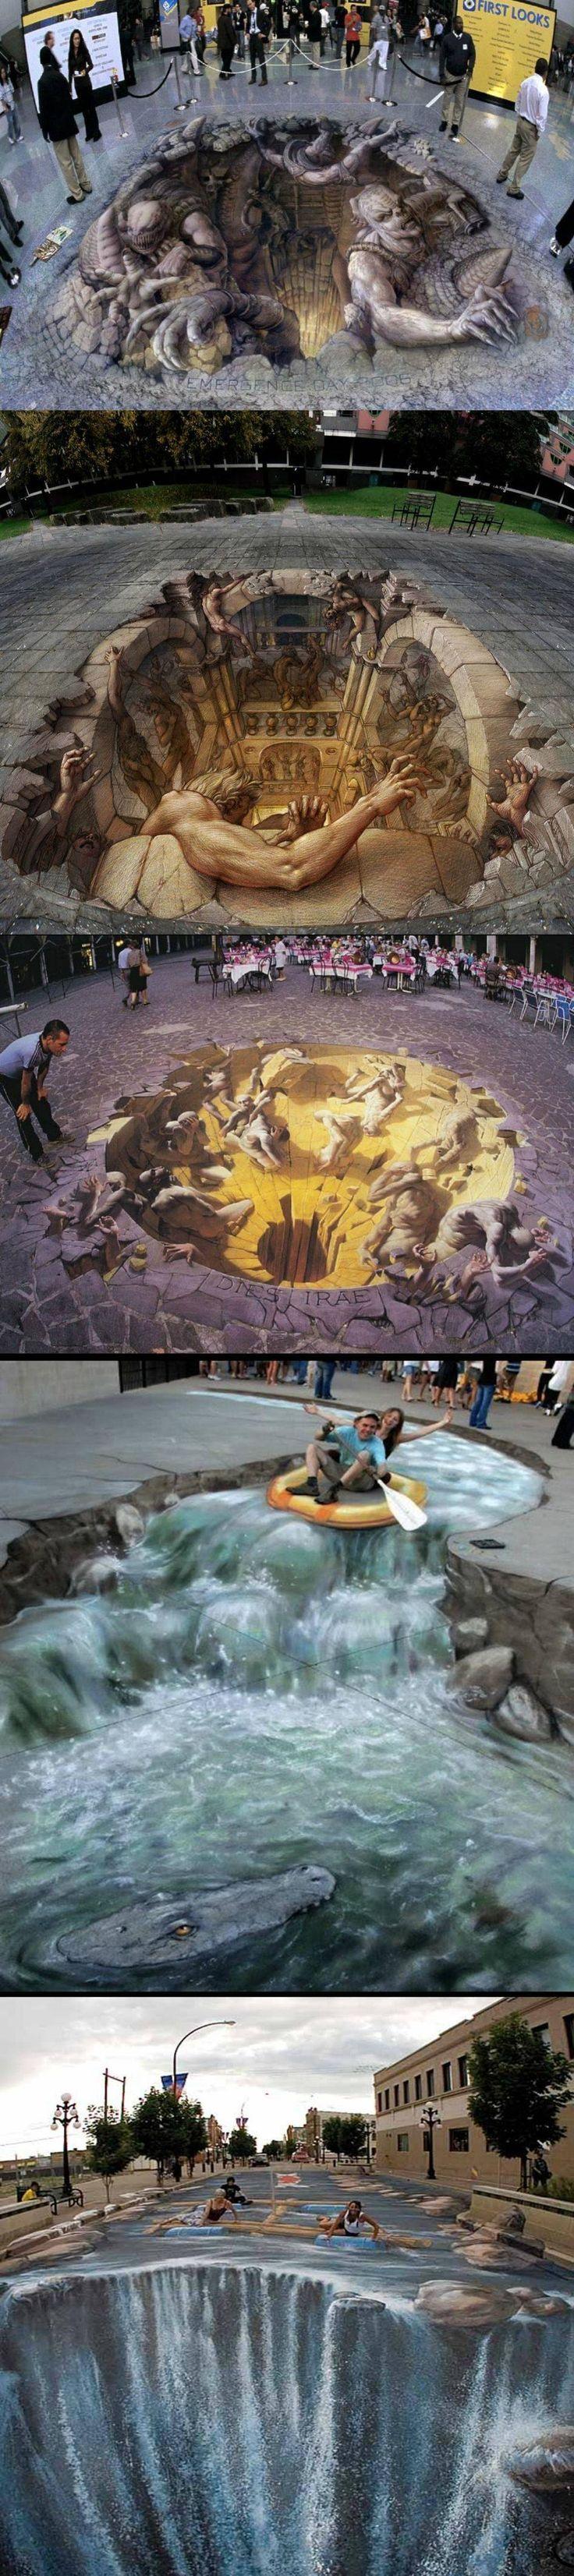 3D amazing chalk street art.I love this art.